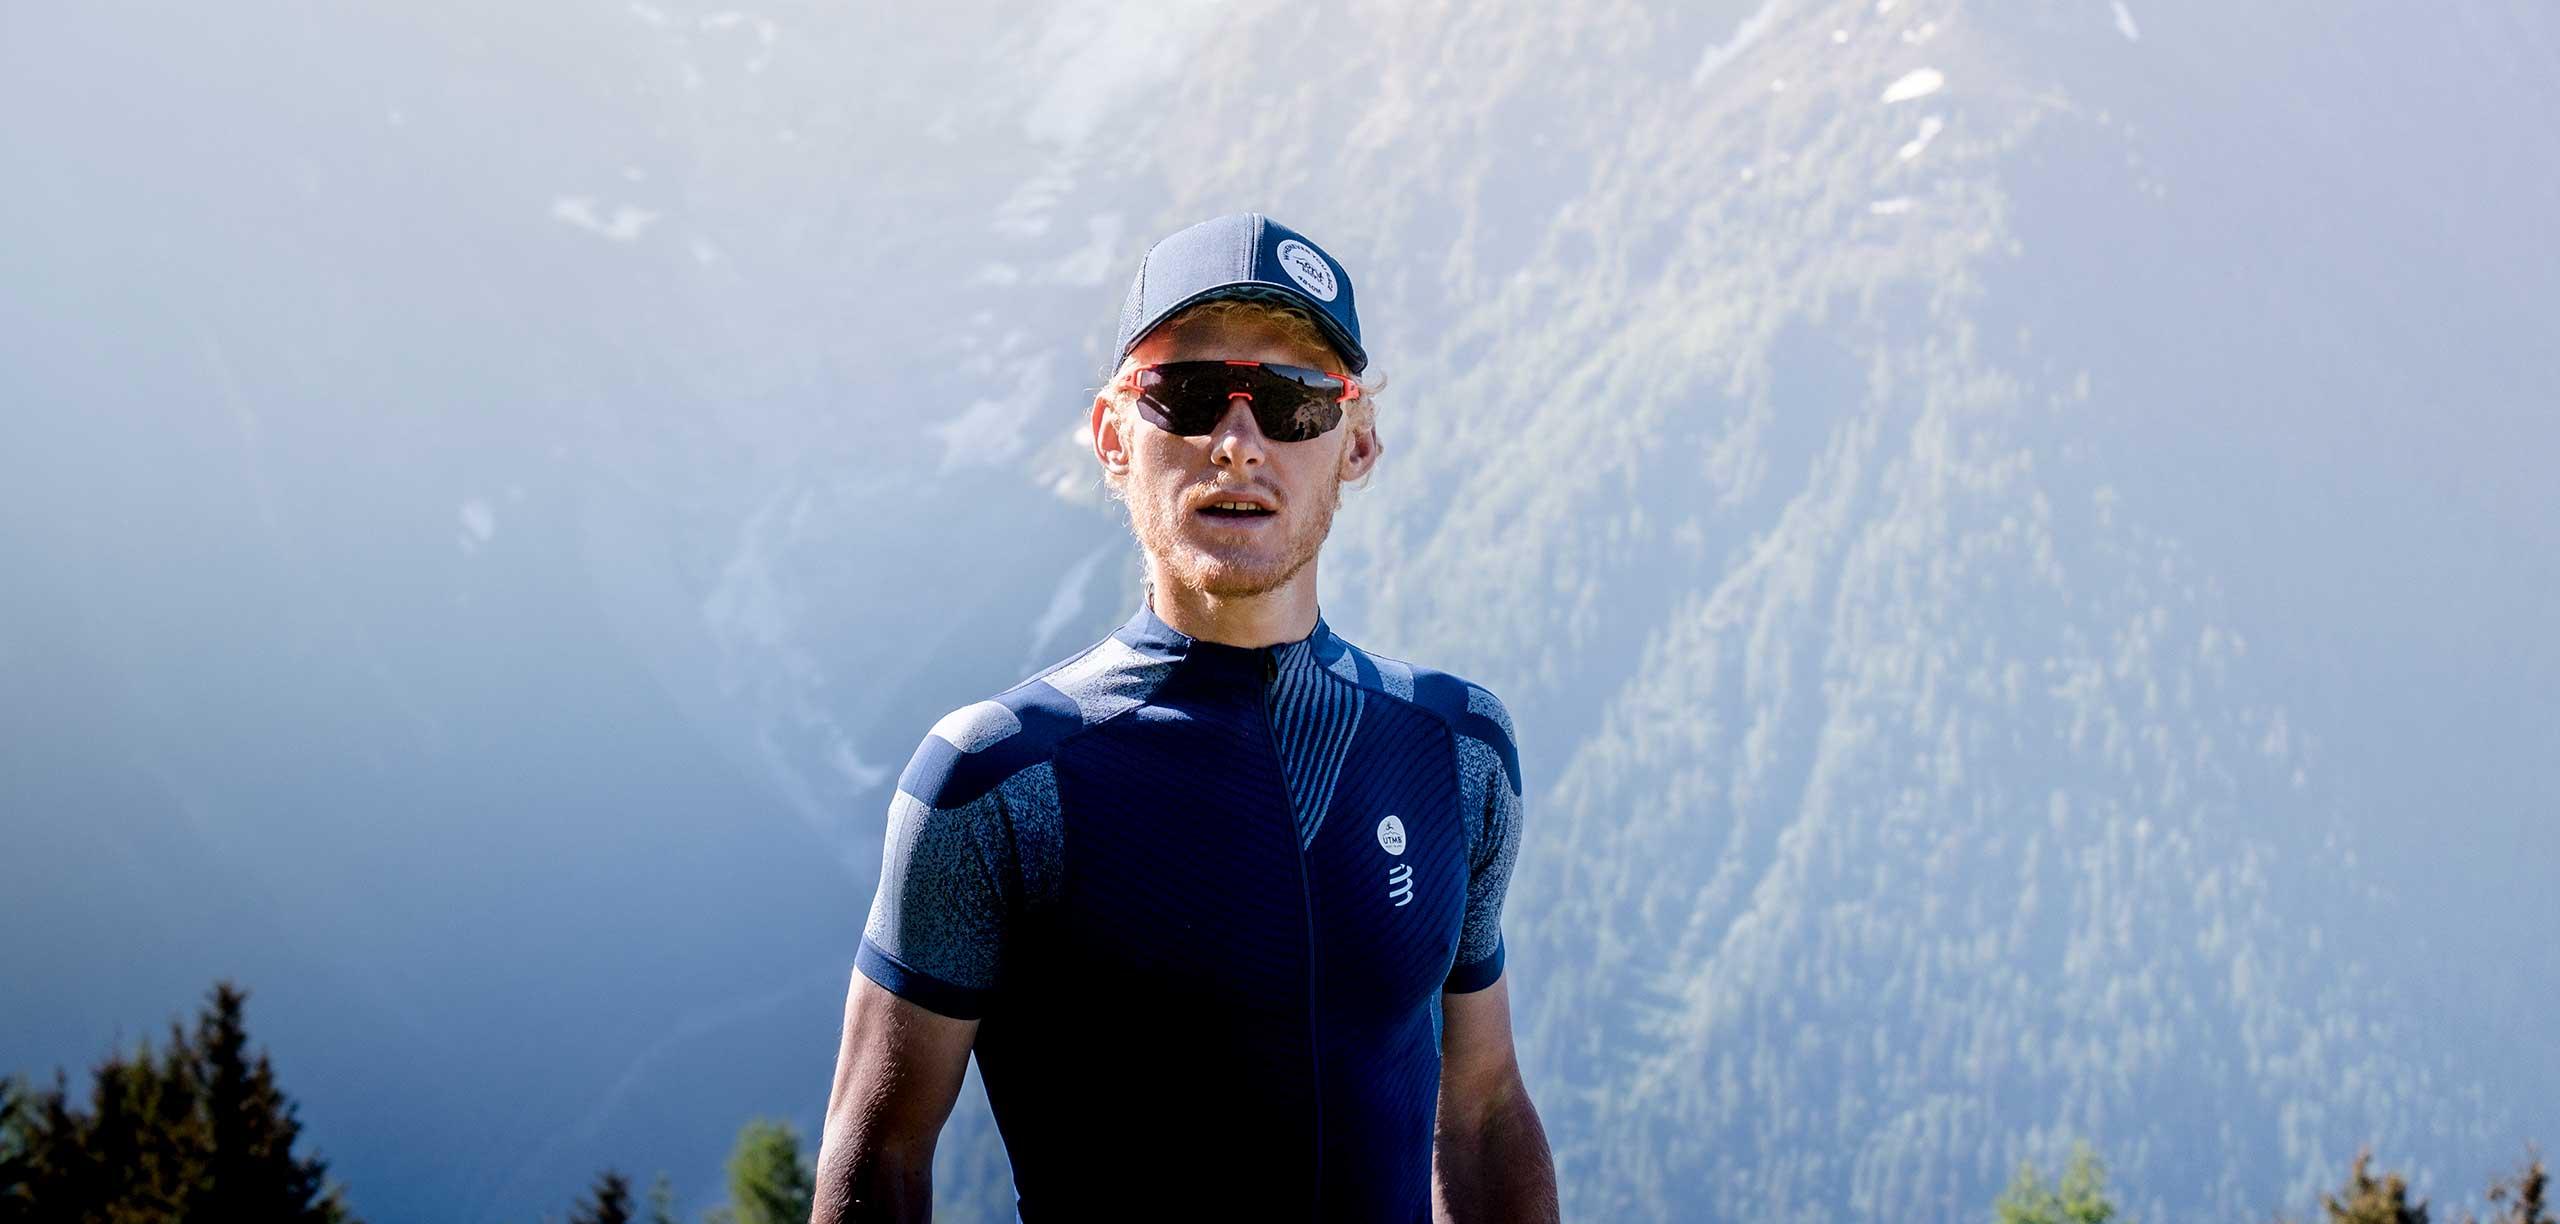 Картуз із сіткою Compressport Trucker Cap - Mont Blanc 2020, Blue